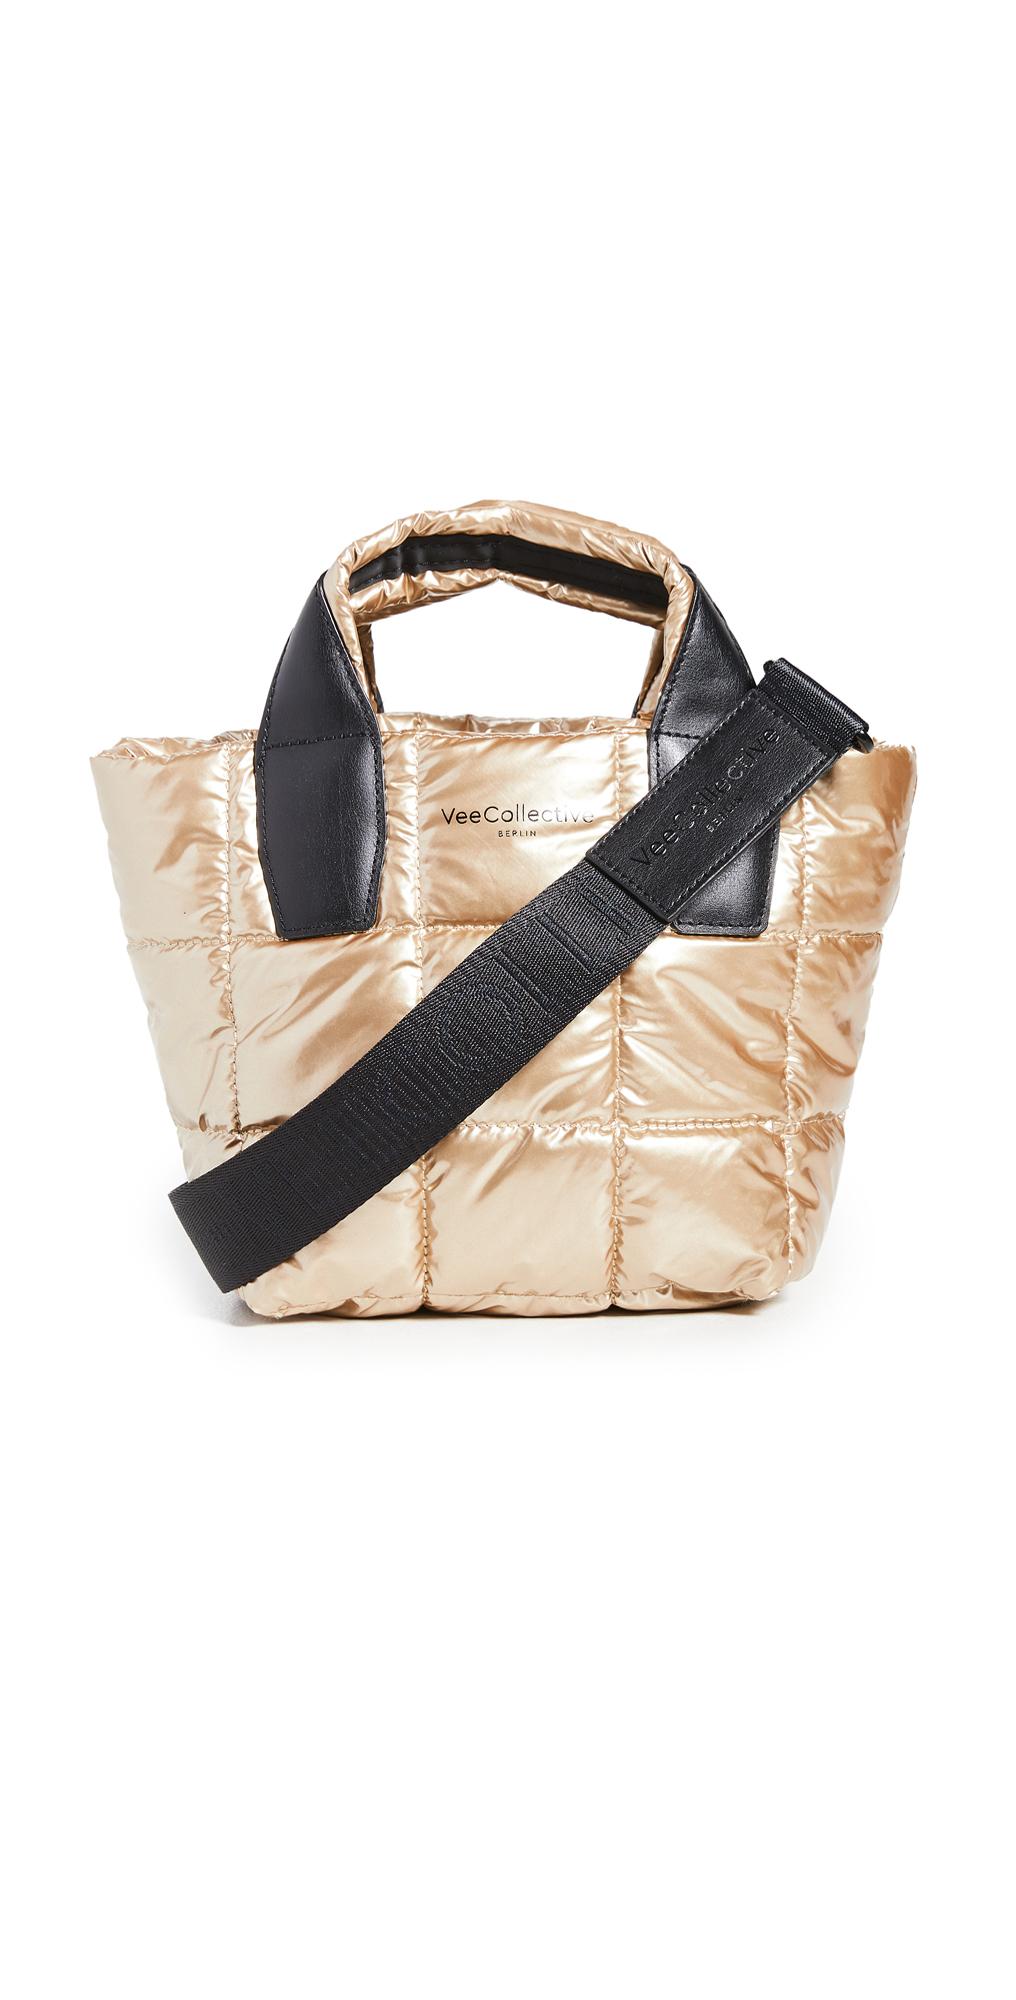 Vee Collective The Porter Mini Gold Metallic Bag